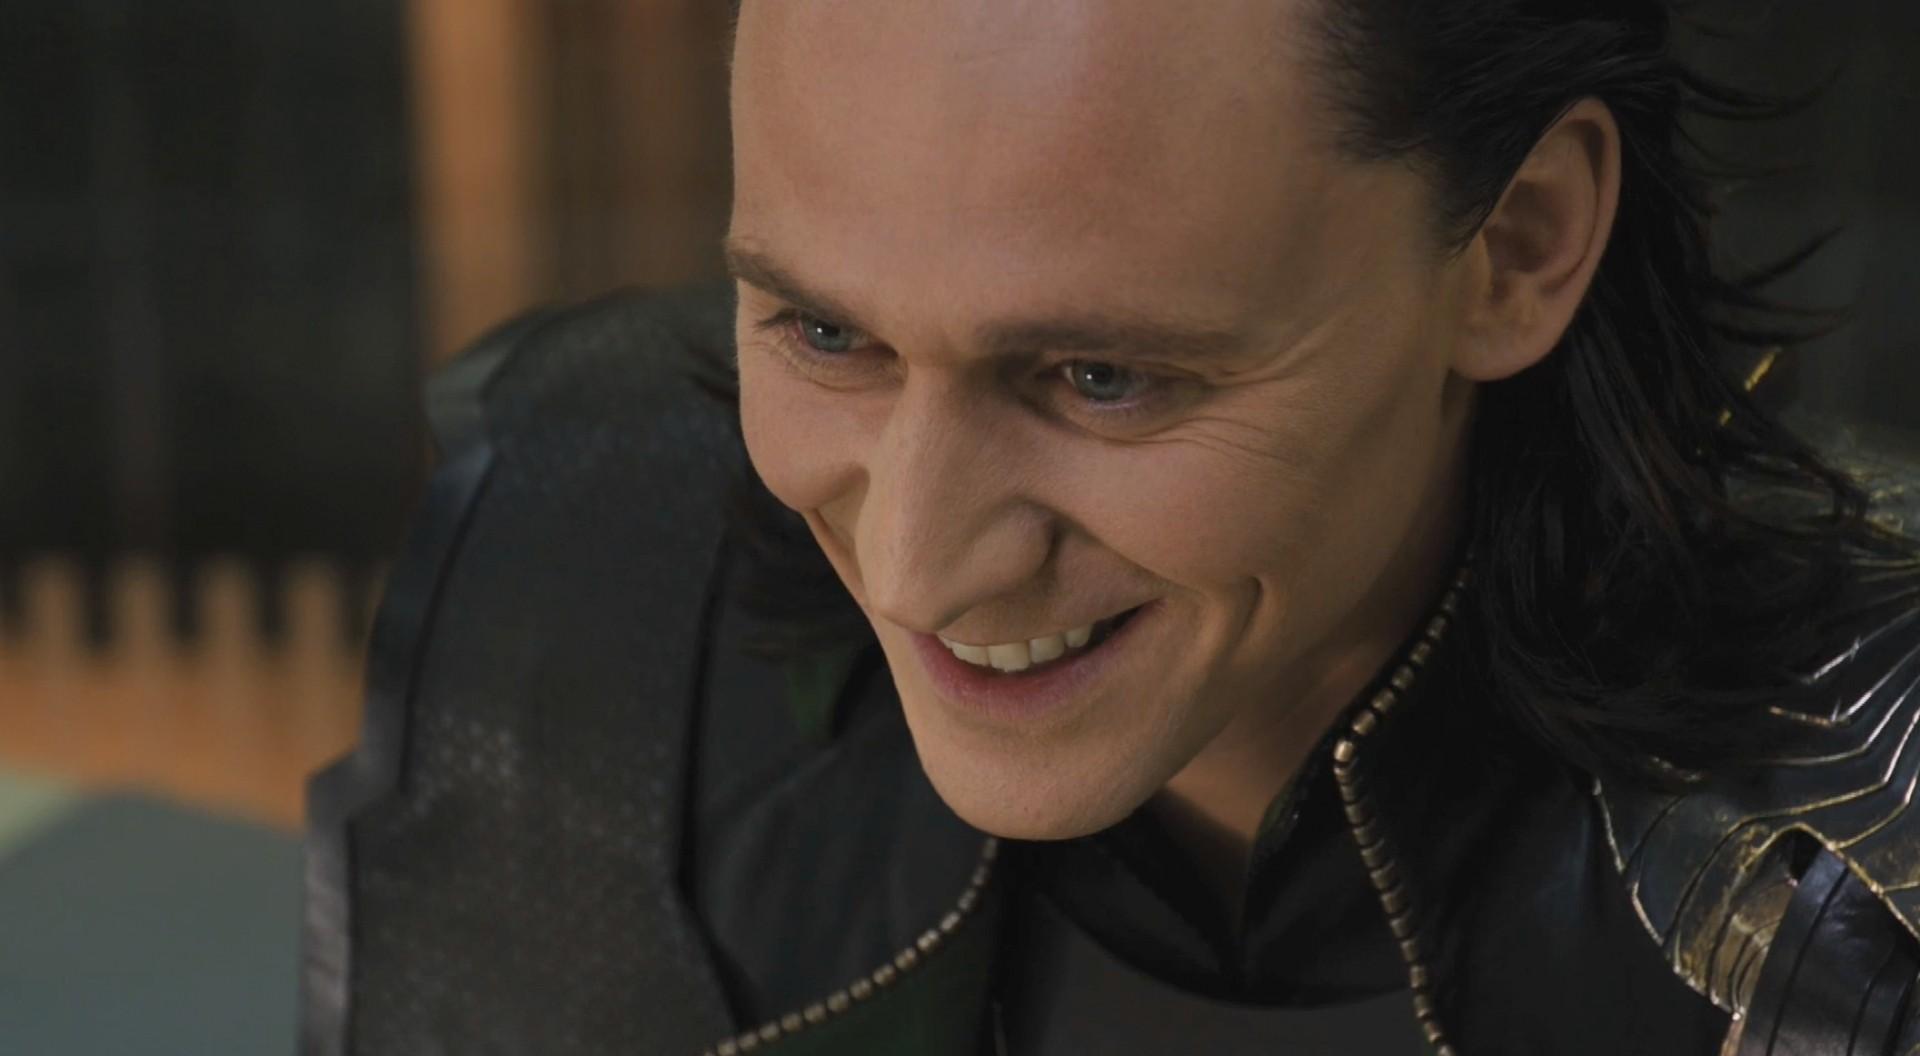 Villain Loki Smile - Villains Photo (31239689) - Fanpop